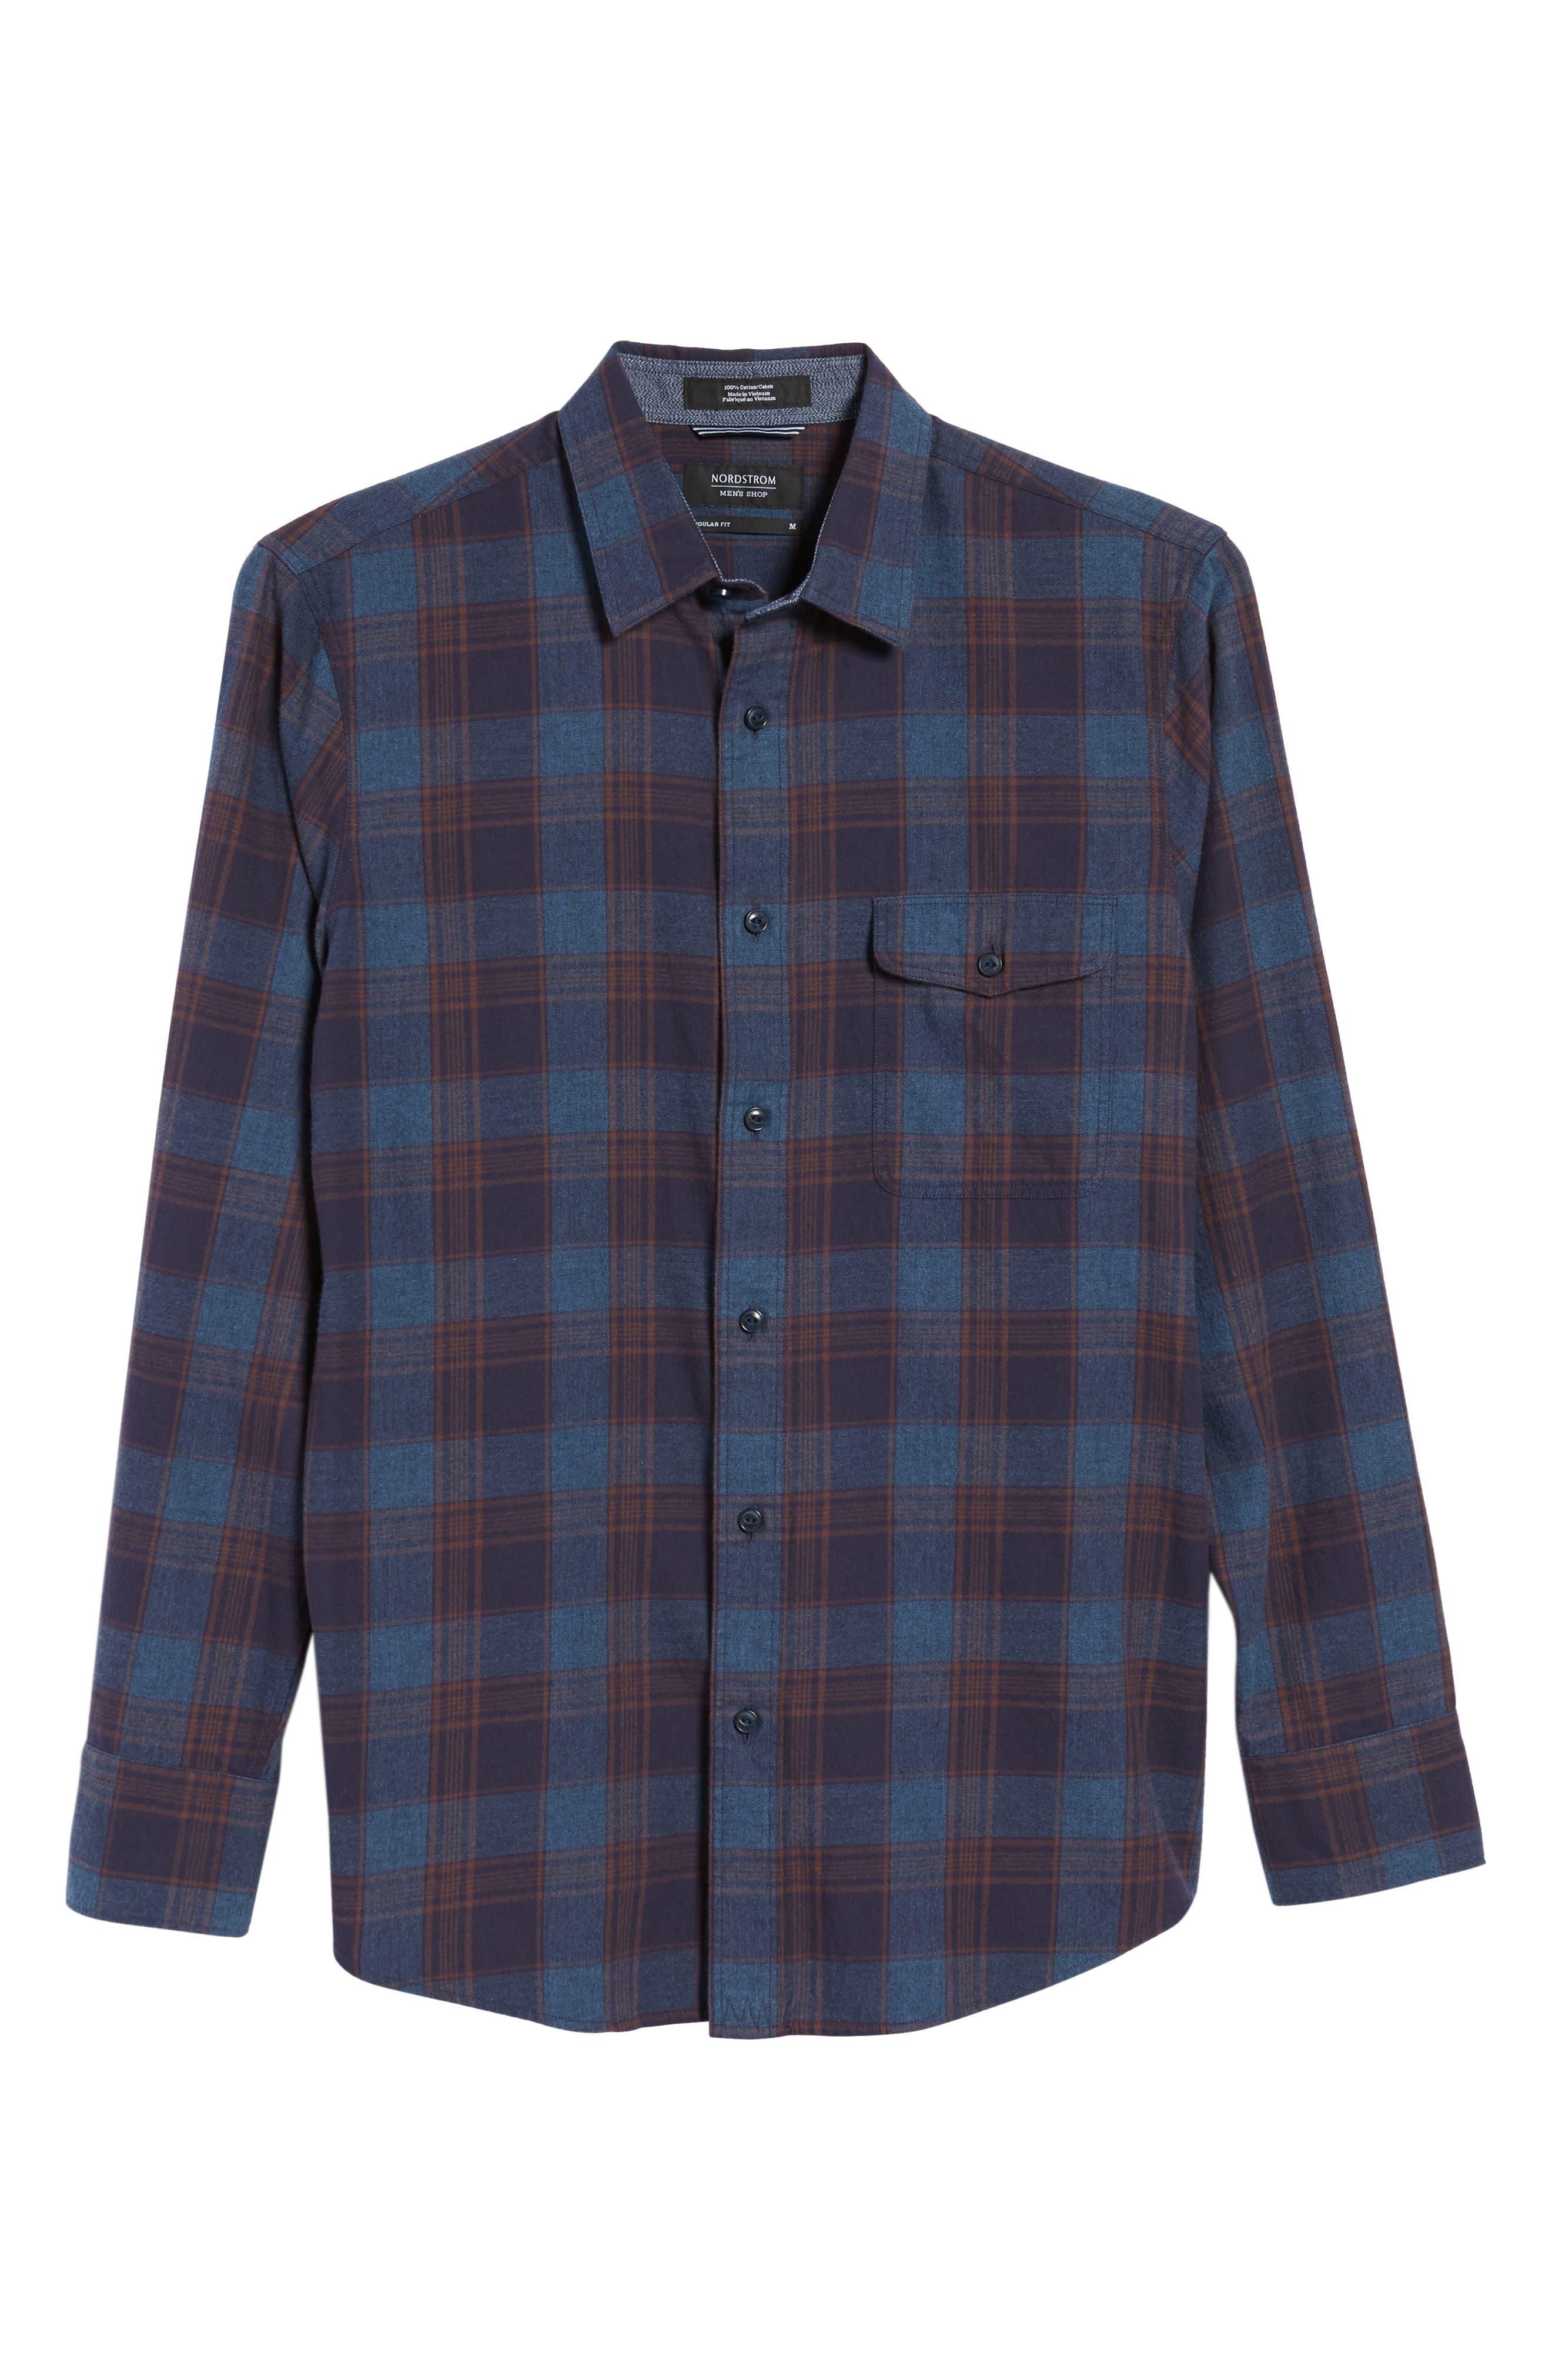 Regular Fit Lumber Check Flannel Shirt,                             Alternate thumbnail 6, color,                             401